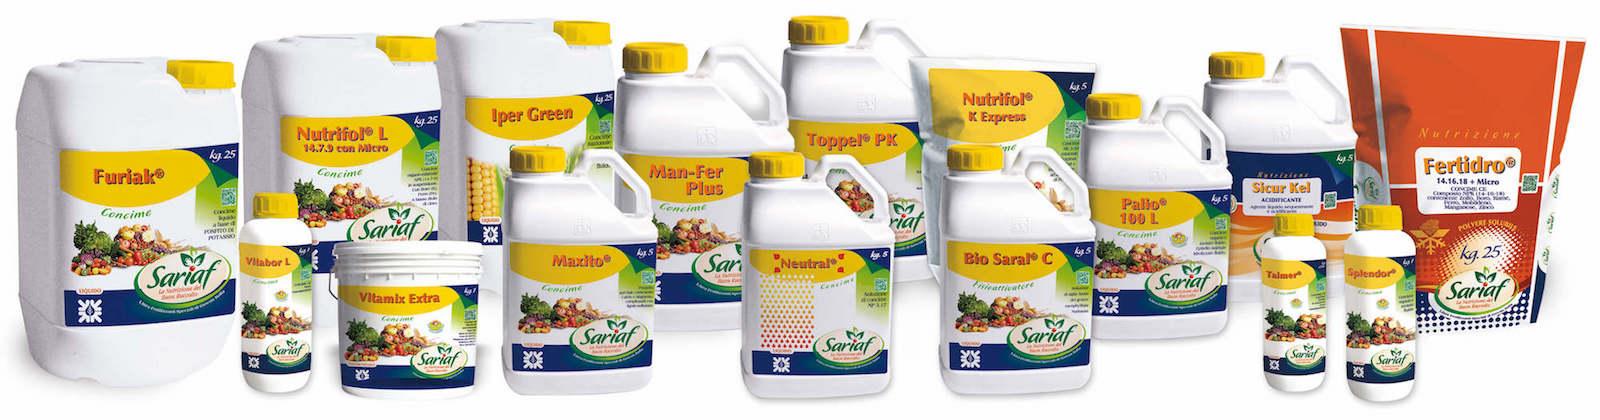 nutrizione prodotti Sariaf Gowan 2016